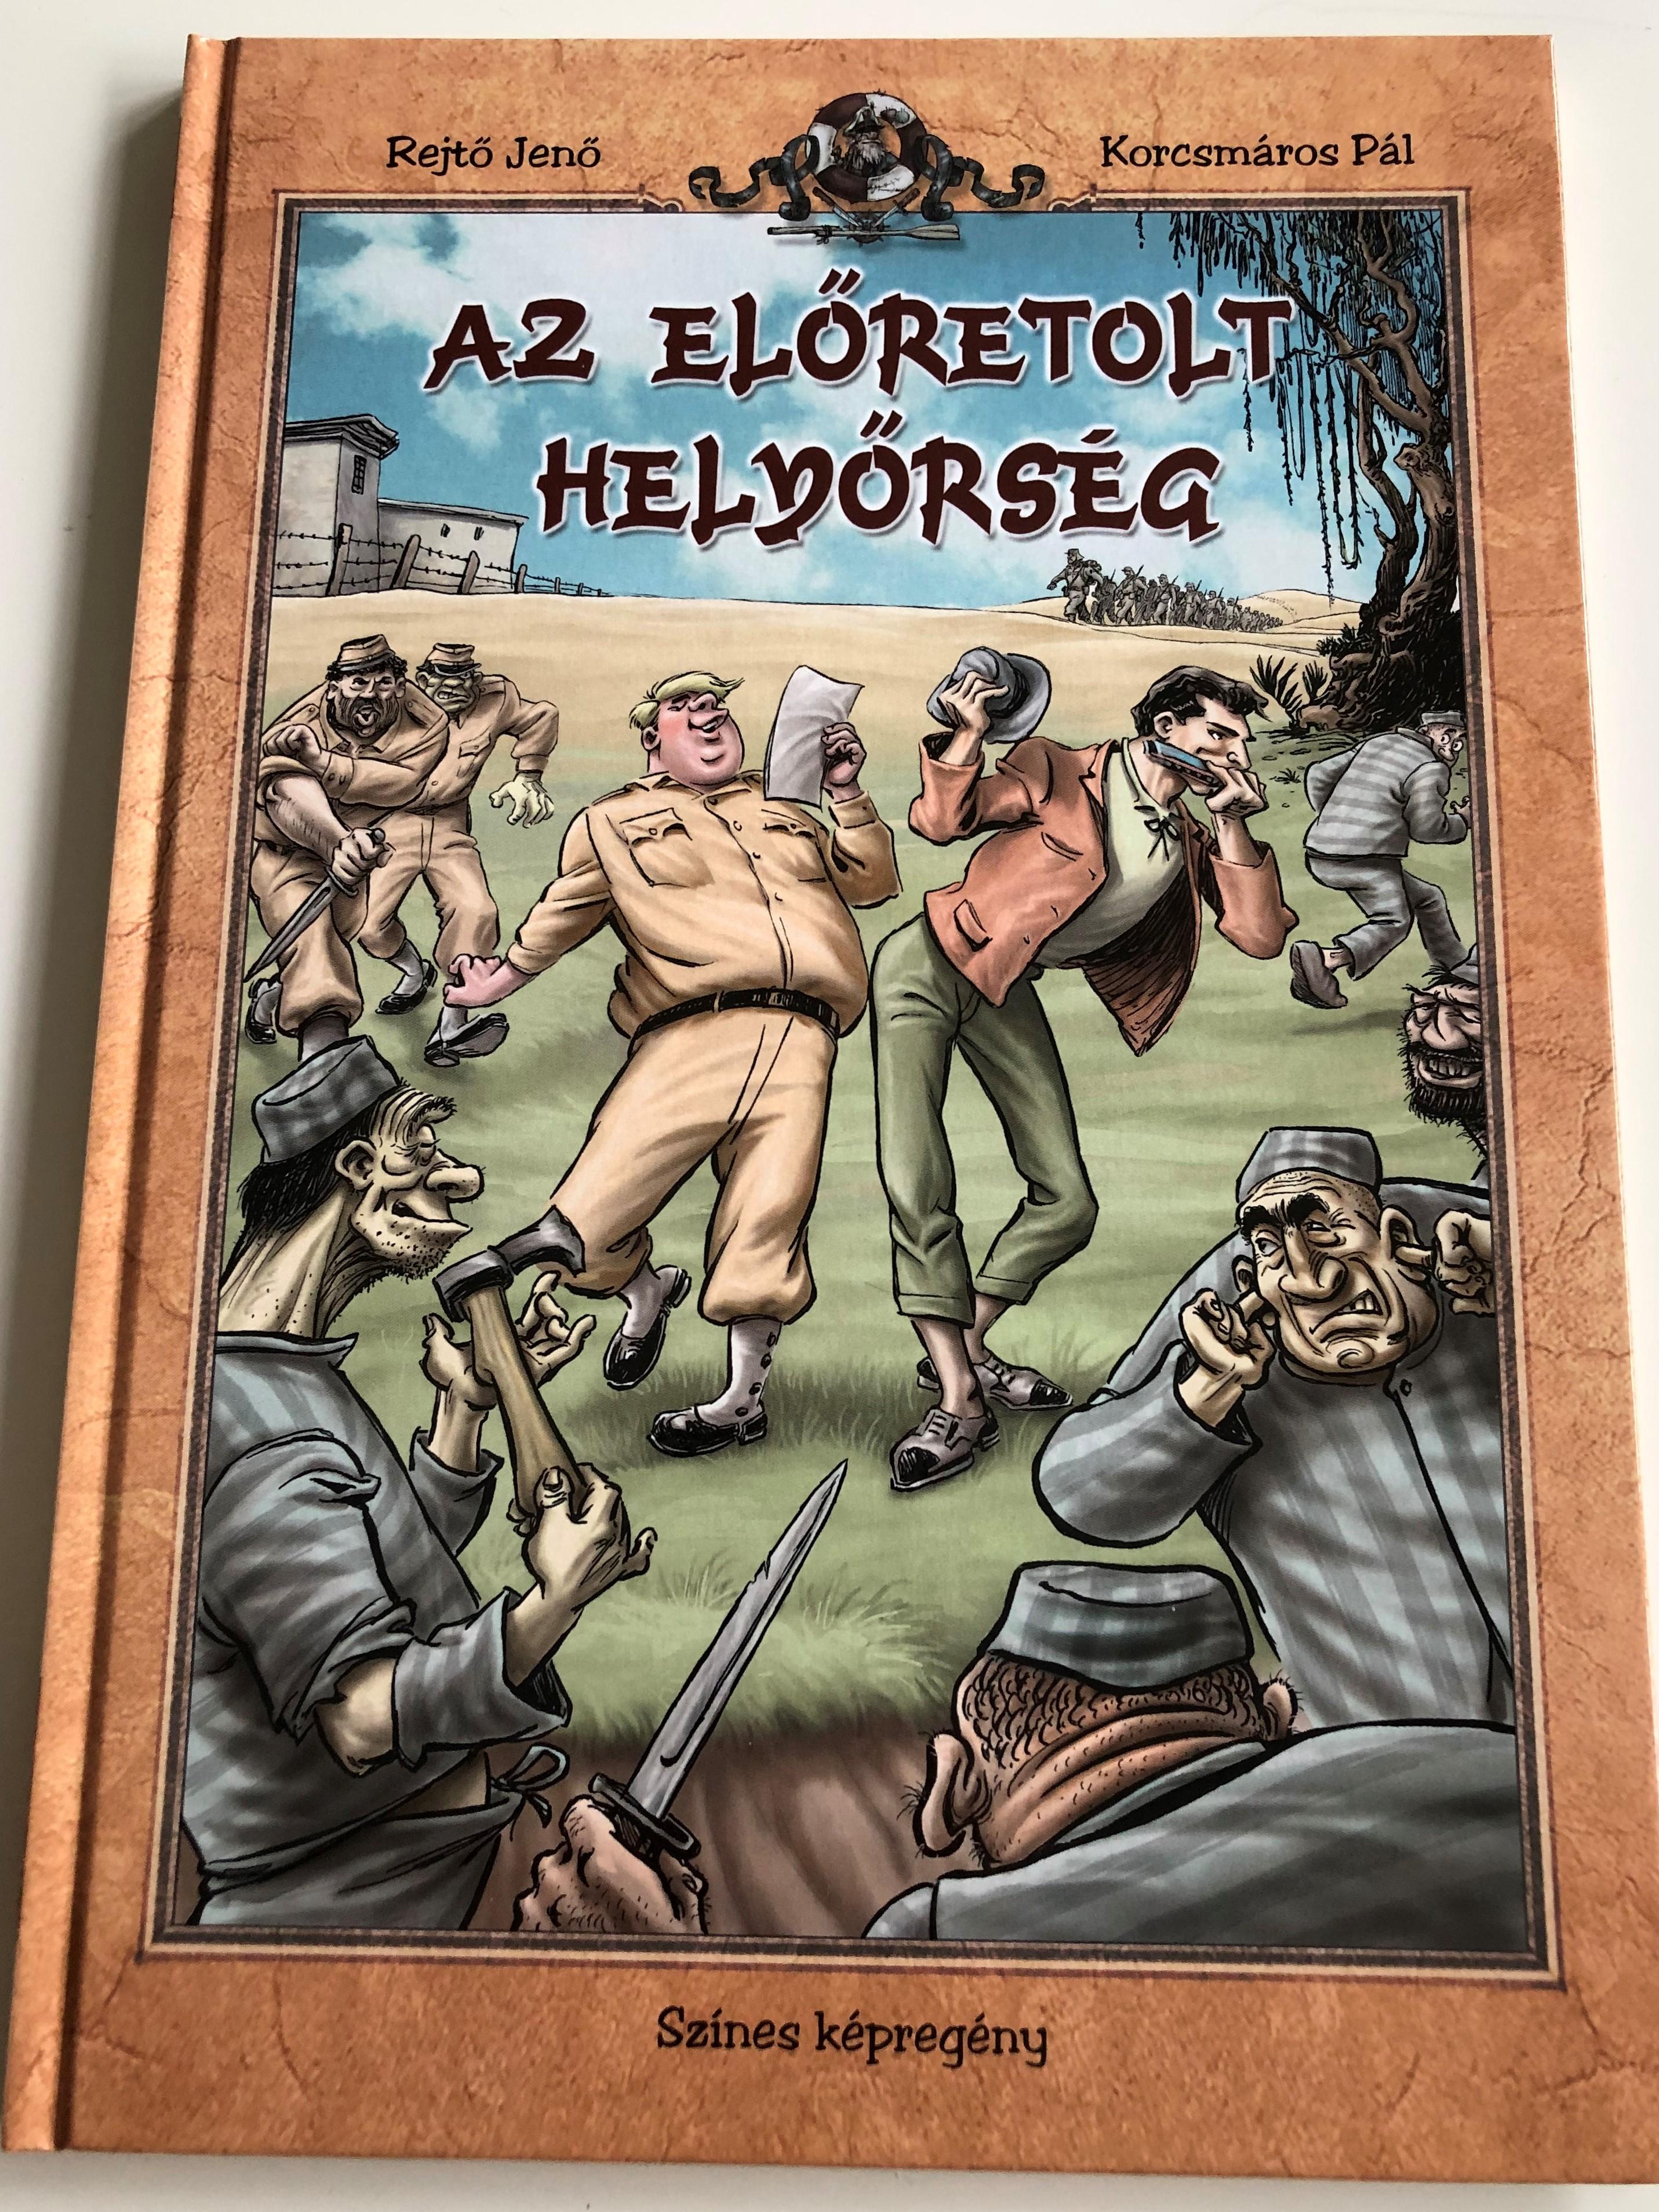 az-el-tretolt-hely-rs-g-by-rejt-jen-korcsm-ros-p-l-sz-nes-k-preg-ny-the-frontier-garrison-color-comic-book-hardcover-2013-3rd-edition-k-pes-kiad-1-.jpg